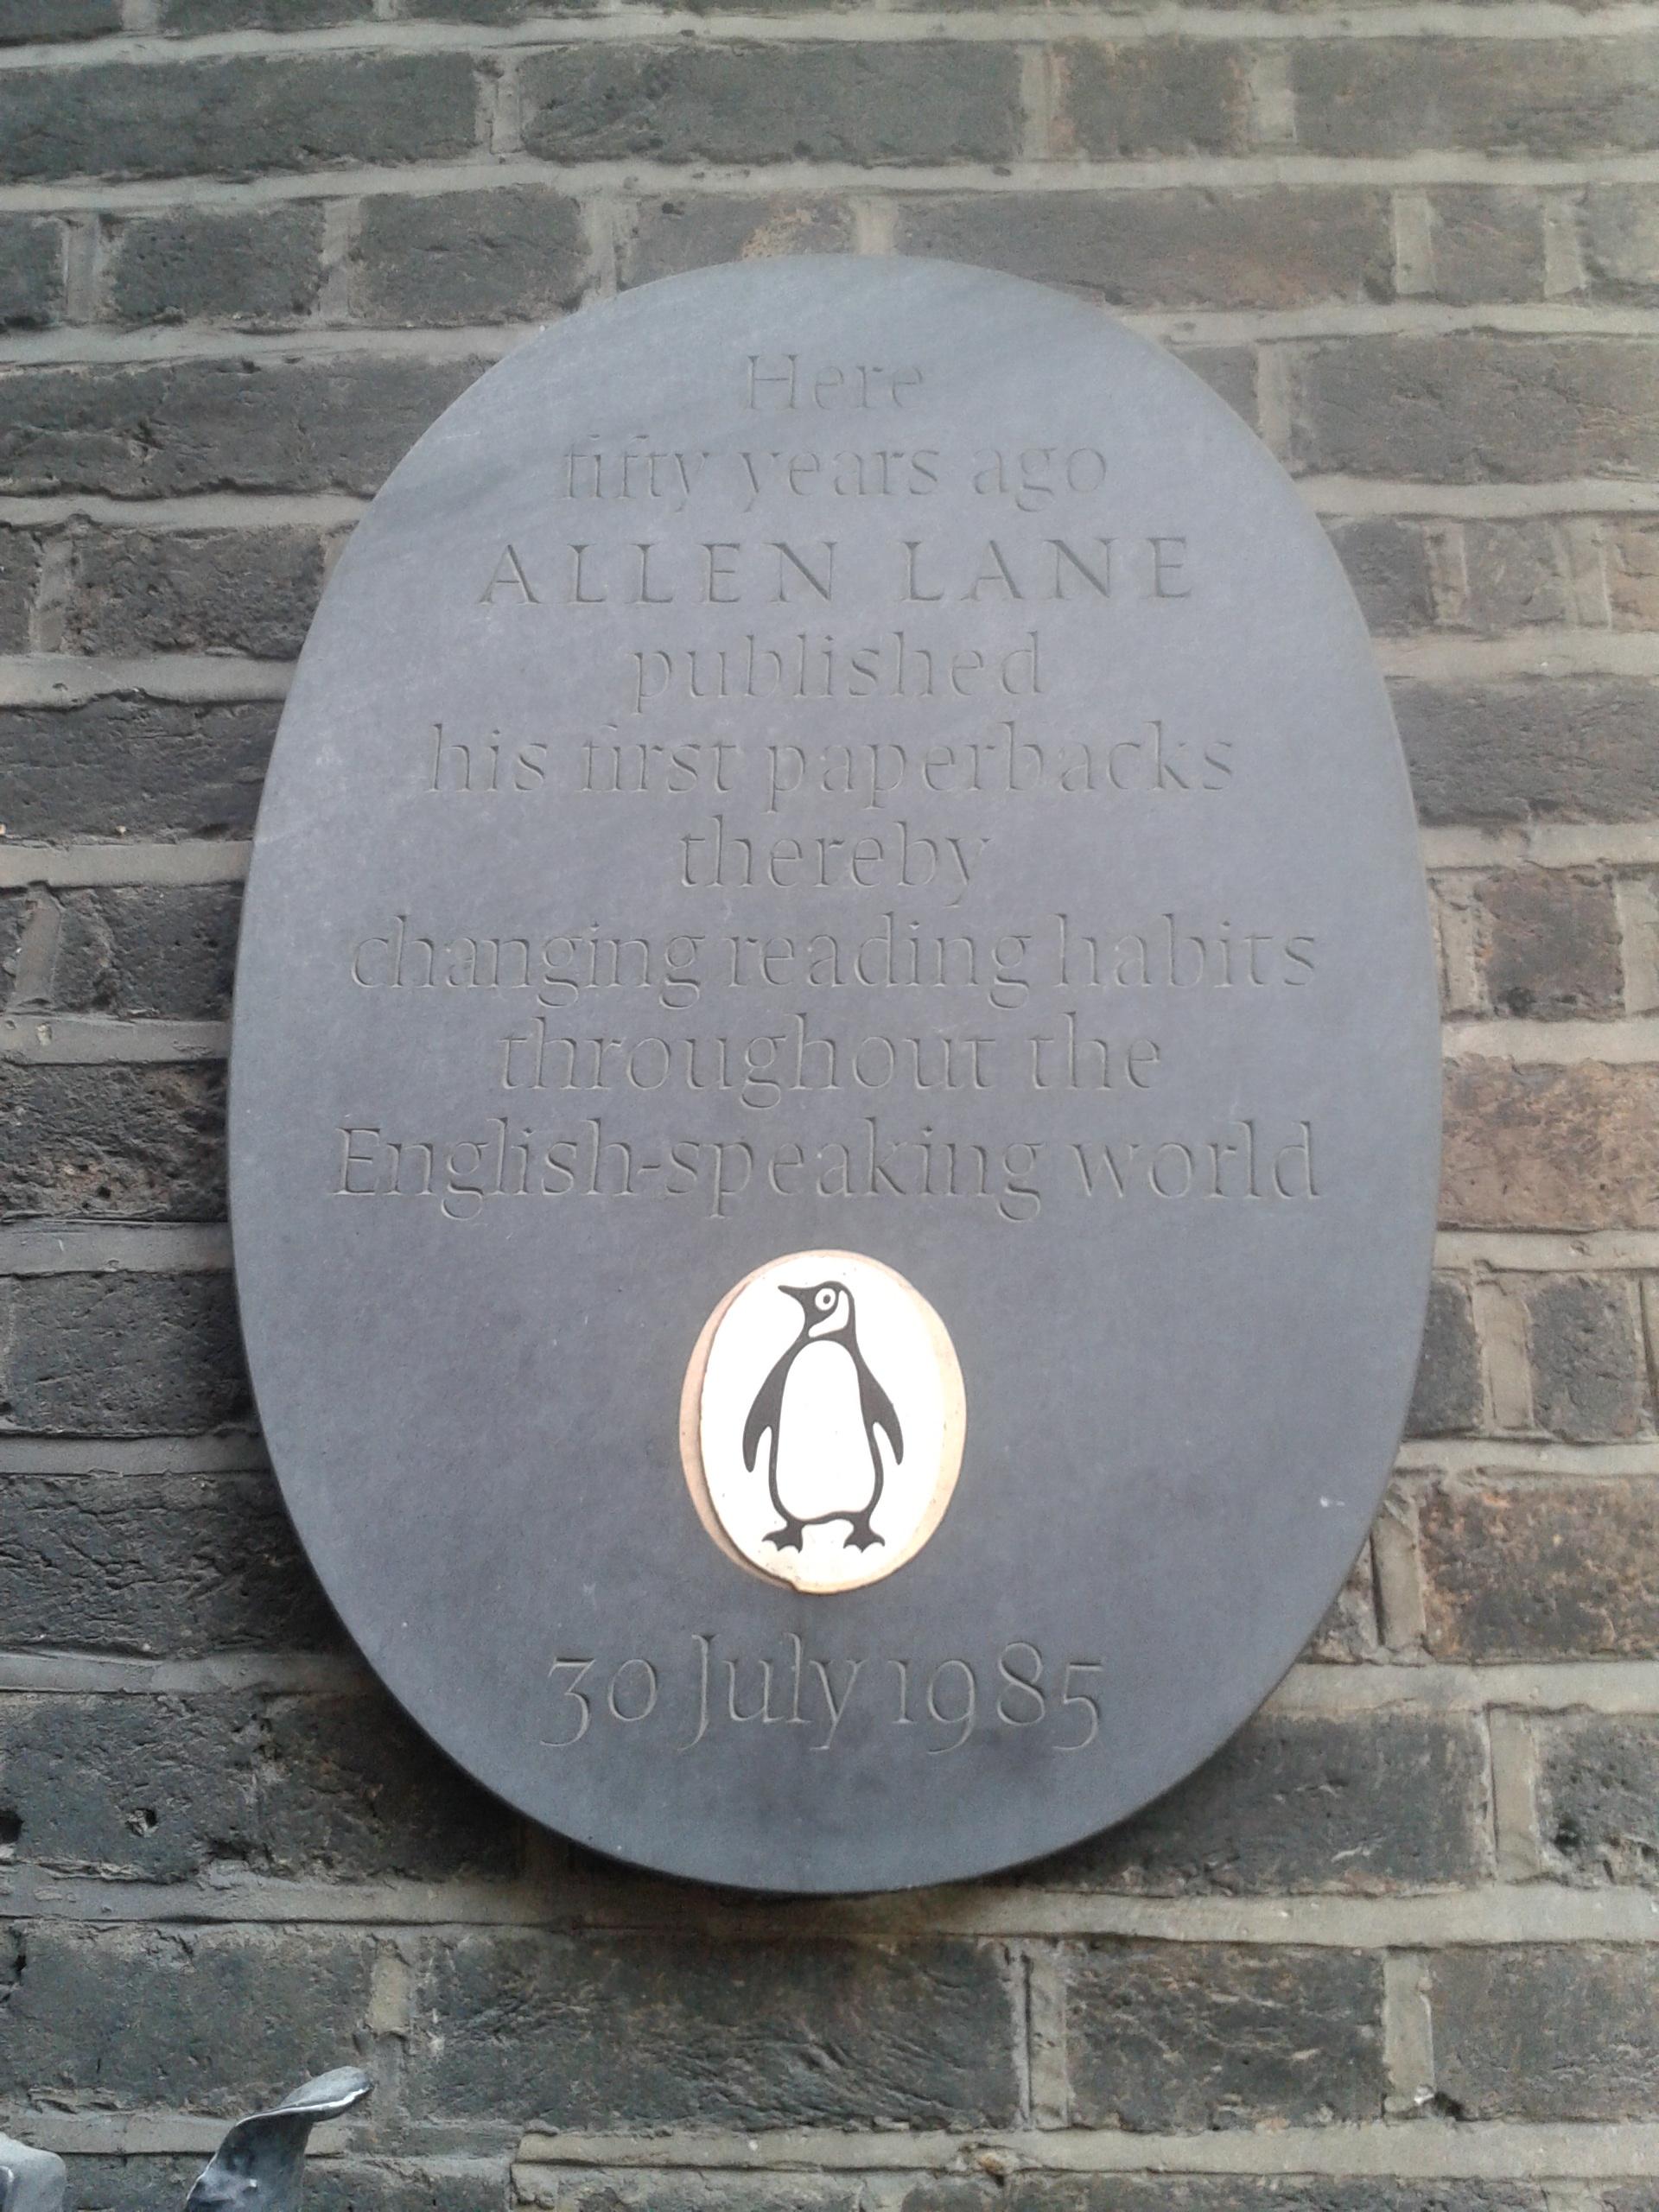 Penguin Books Wikipedia